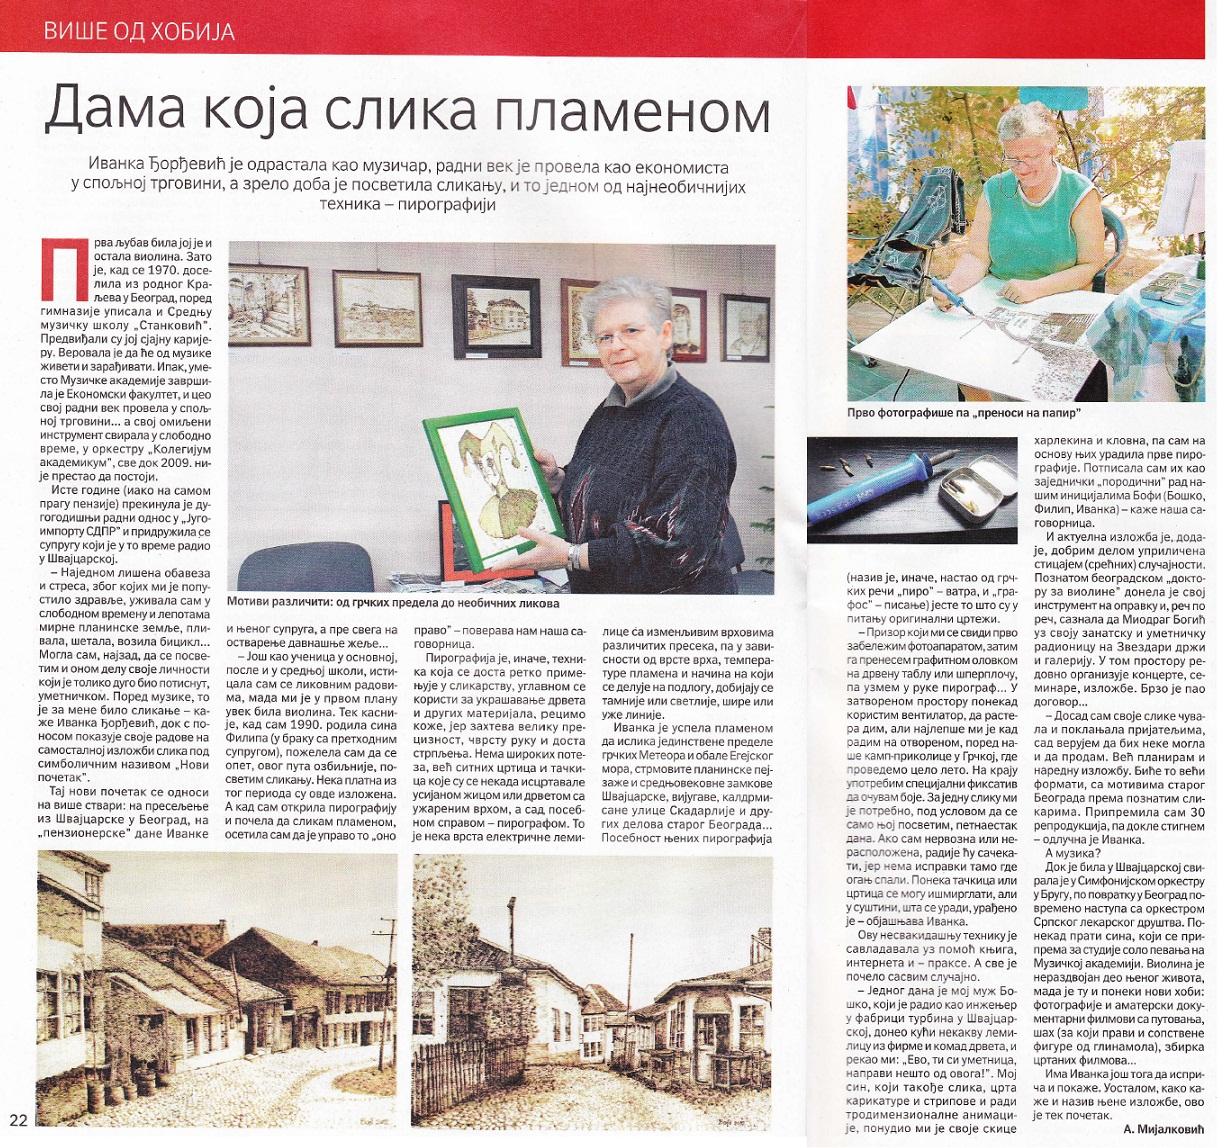 IDJ Politika Magazin 30.12.2012